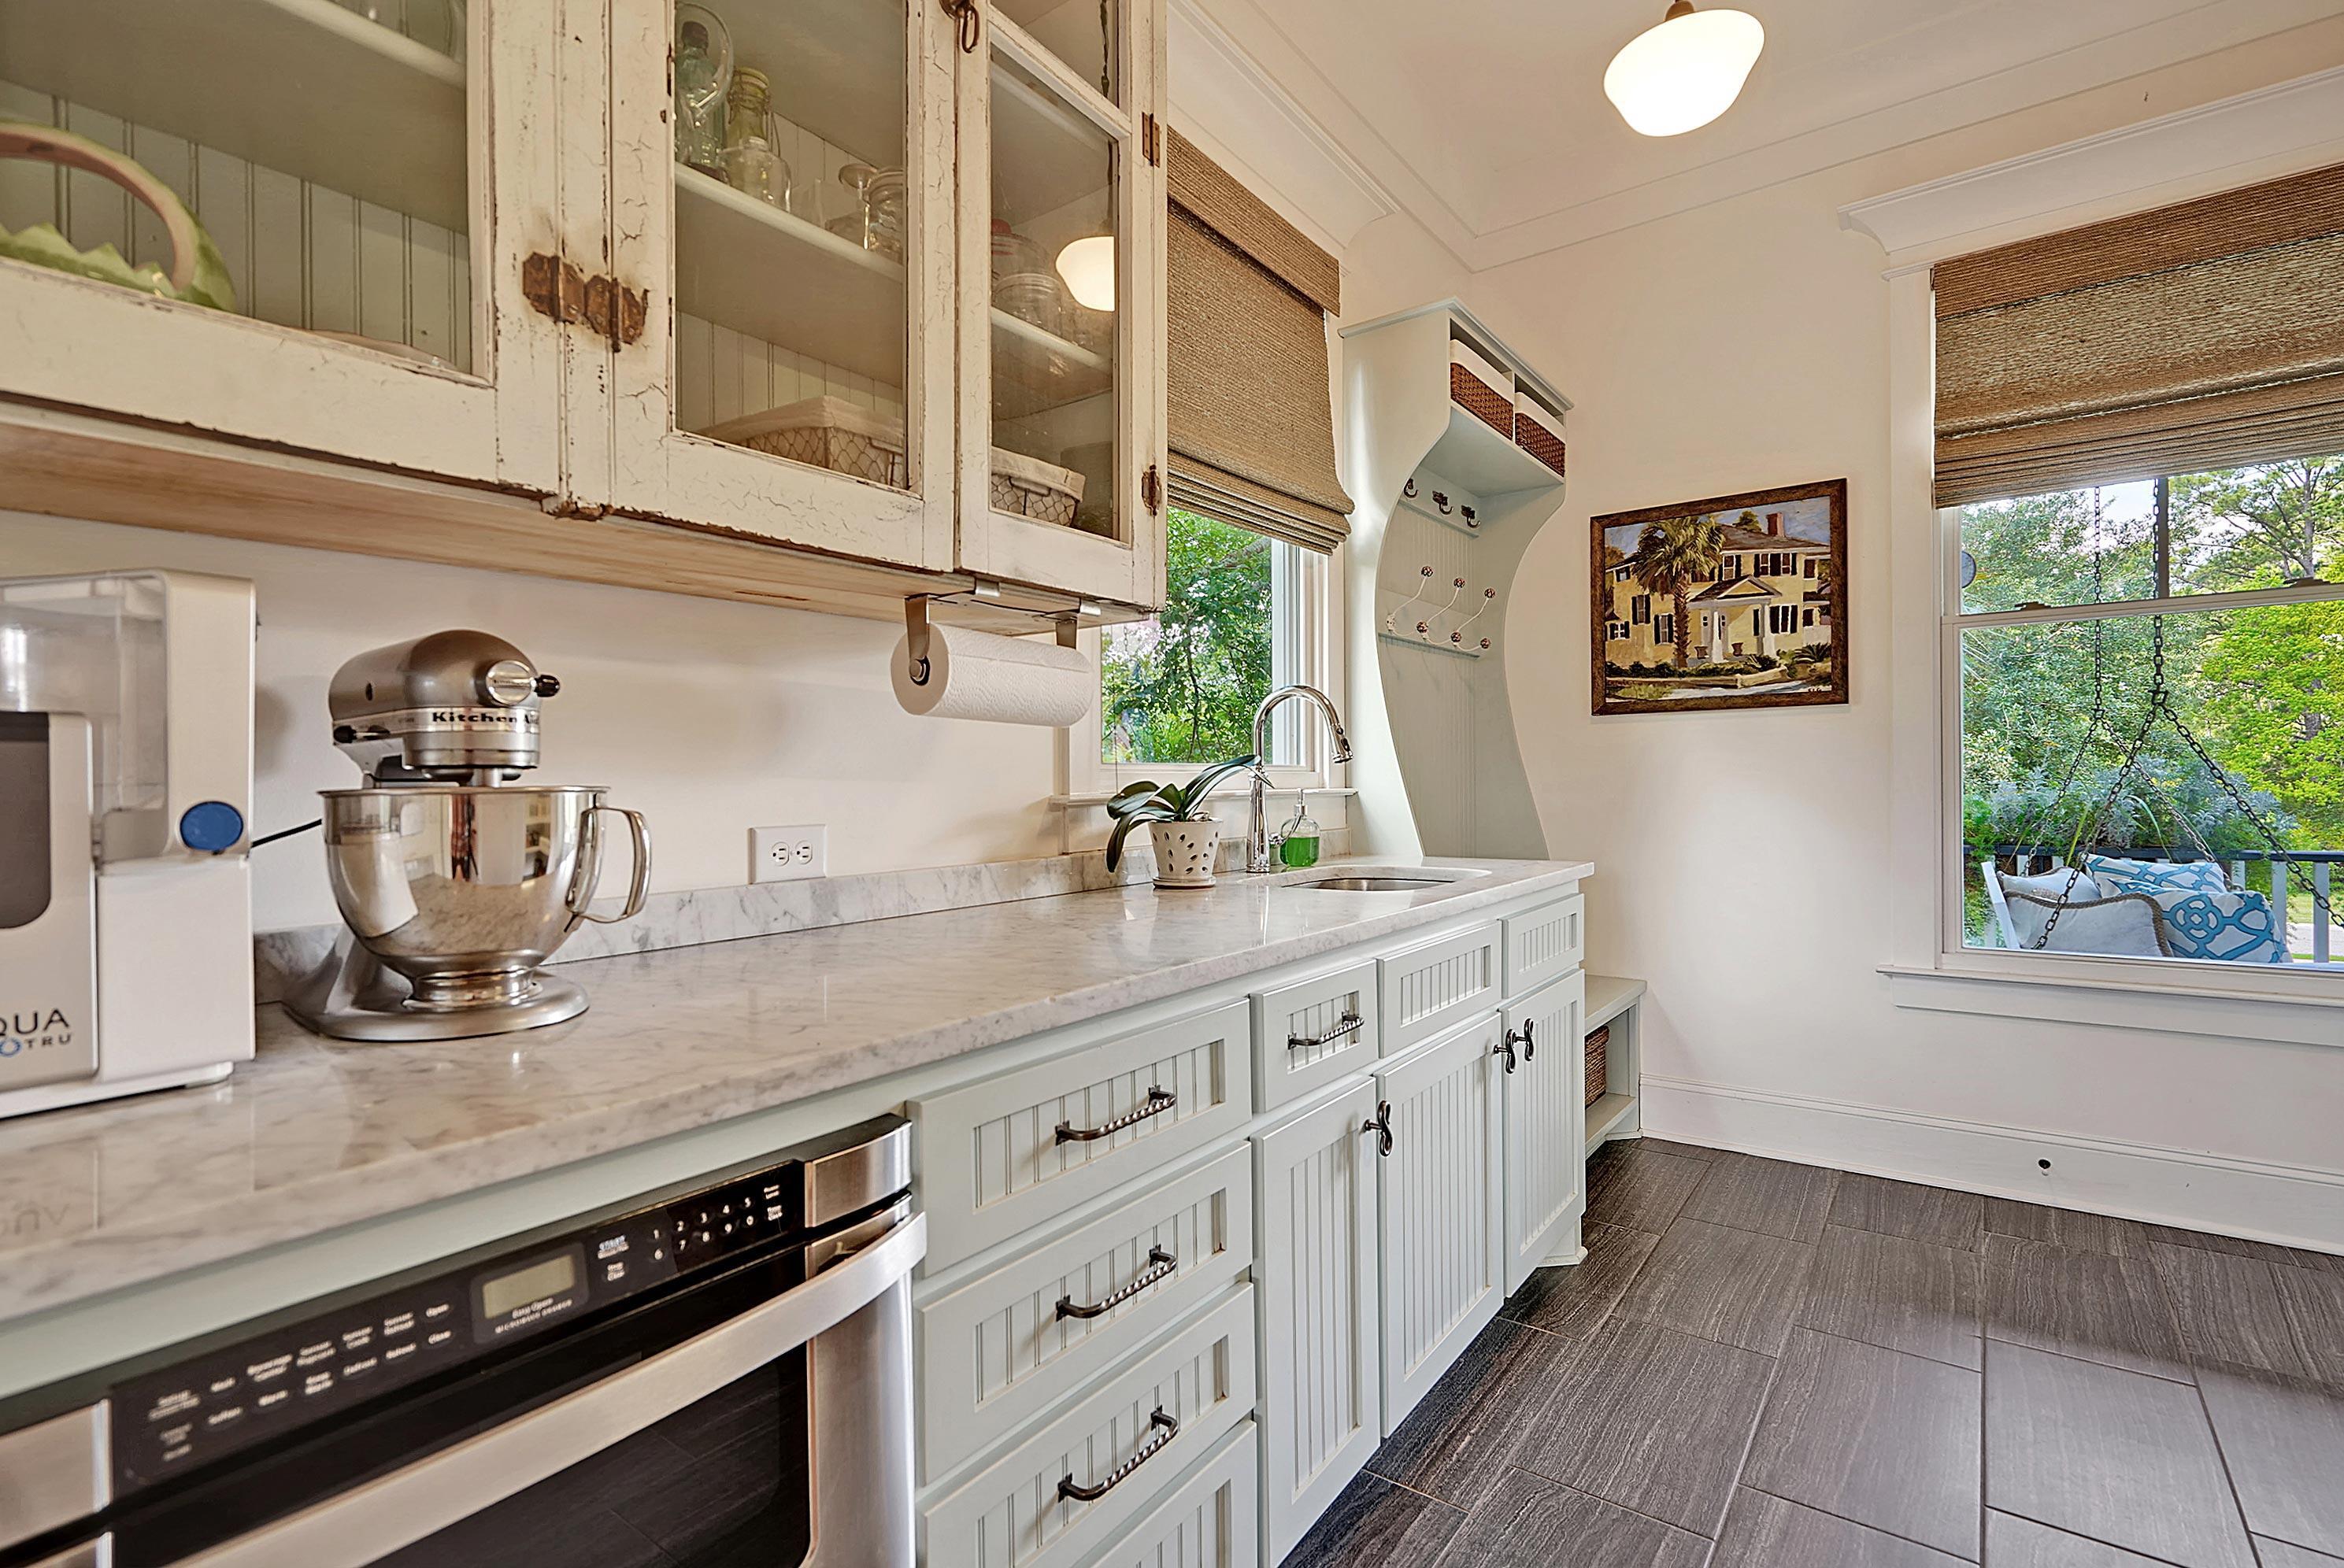 Grassy Creek Homes For Sale - 294 River Oak, Mount Pleasant, SC - 0